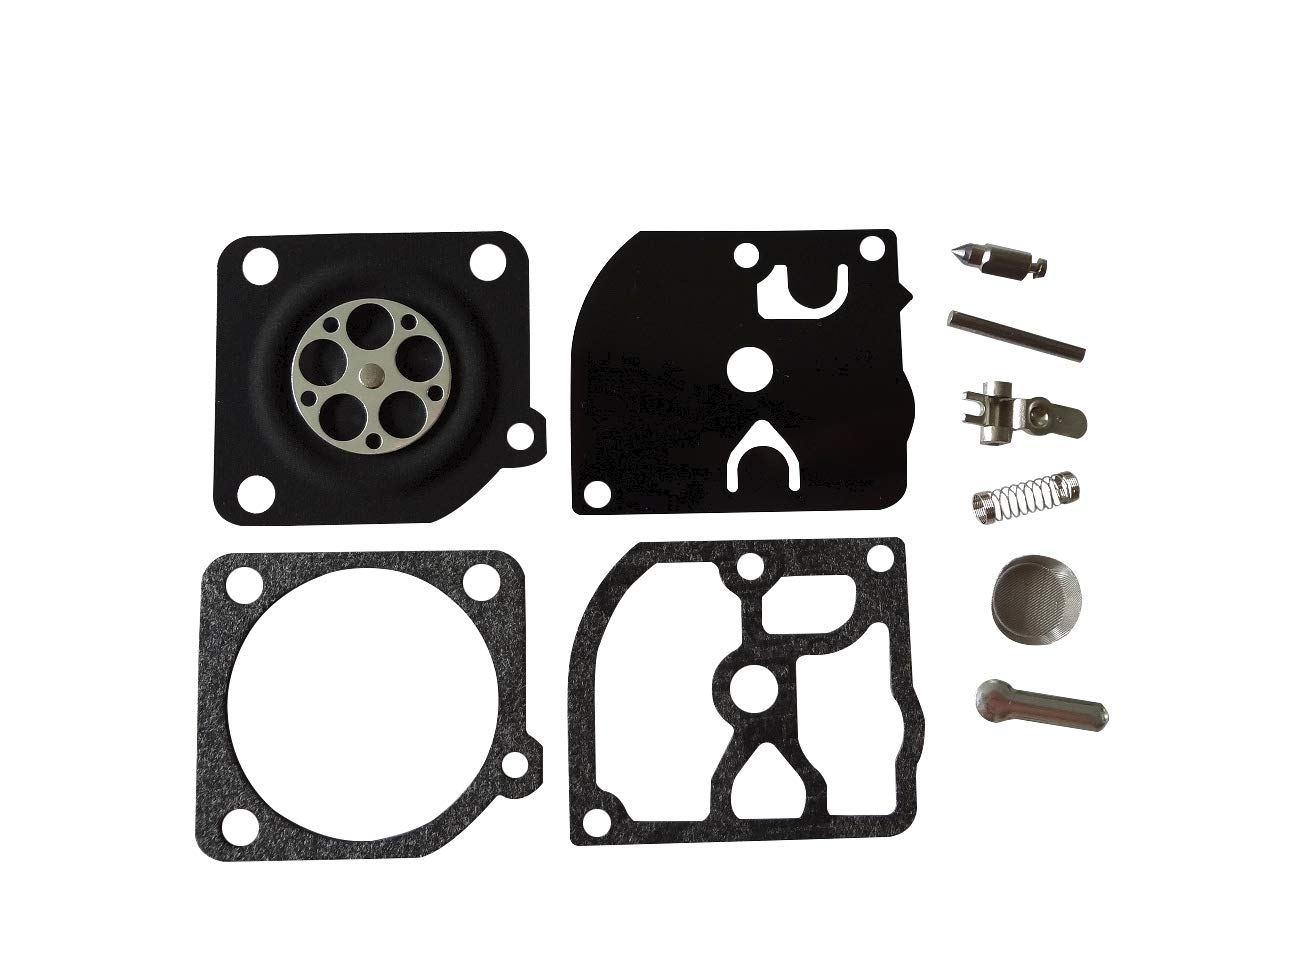 Carburetor Repair/Rebuild Kit Replaces ZAMA RB-39 for Zama C1Q Carburetors Homelite 250 McCulloch 38cc 35cc 32cc Chainsaw Eager Beaver 3214